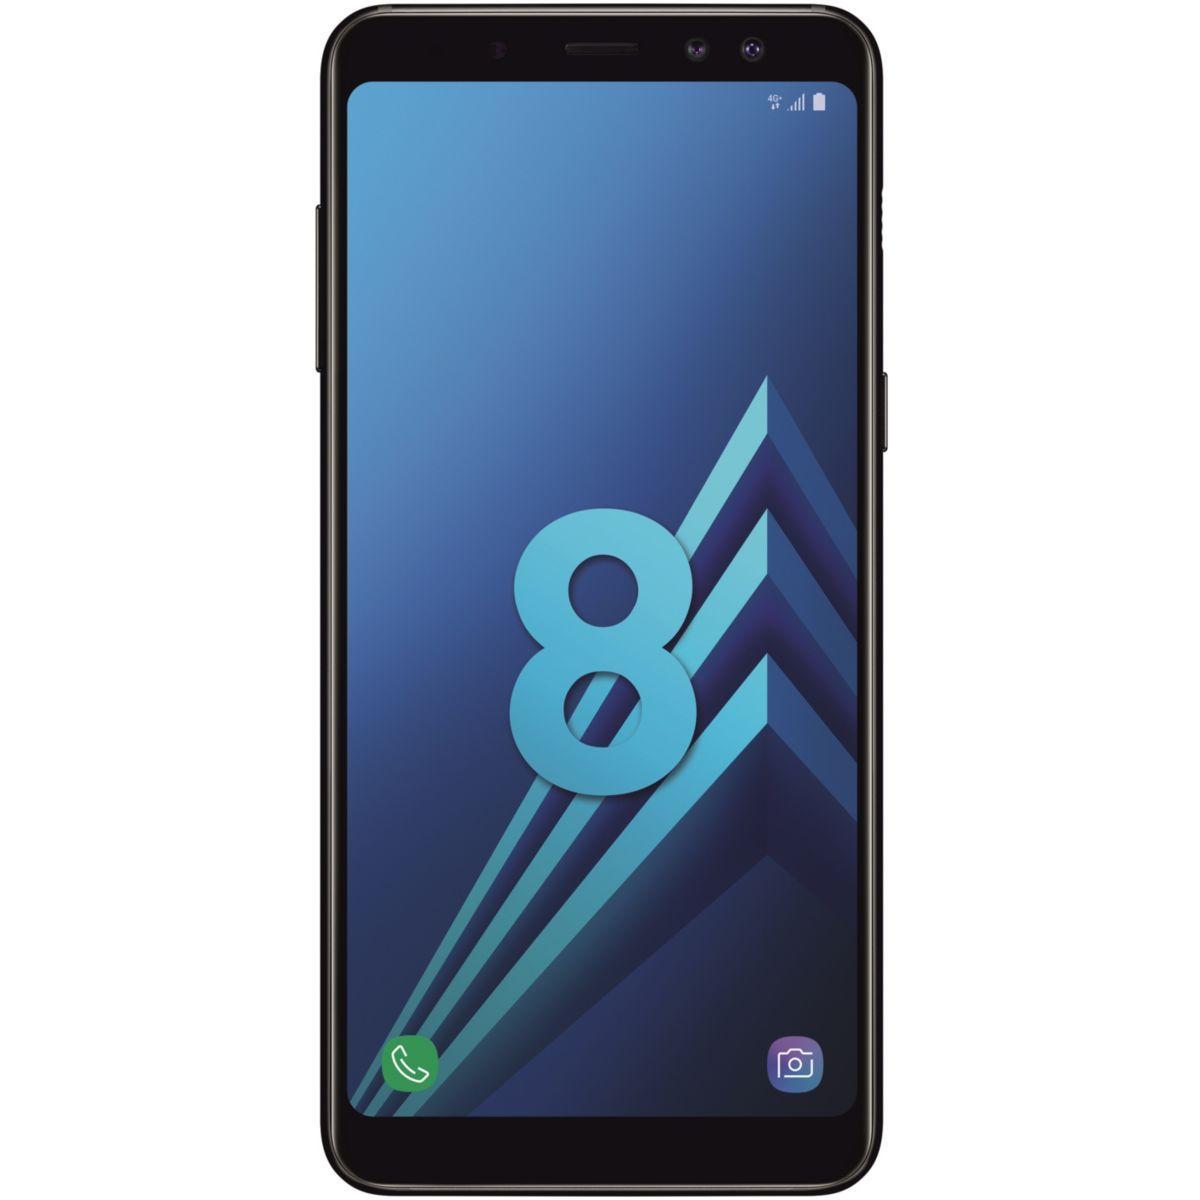 Smartphone samsung galaxy a8 noir dual s - livraison offerte : code liv